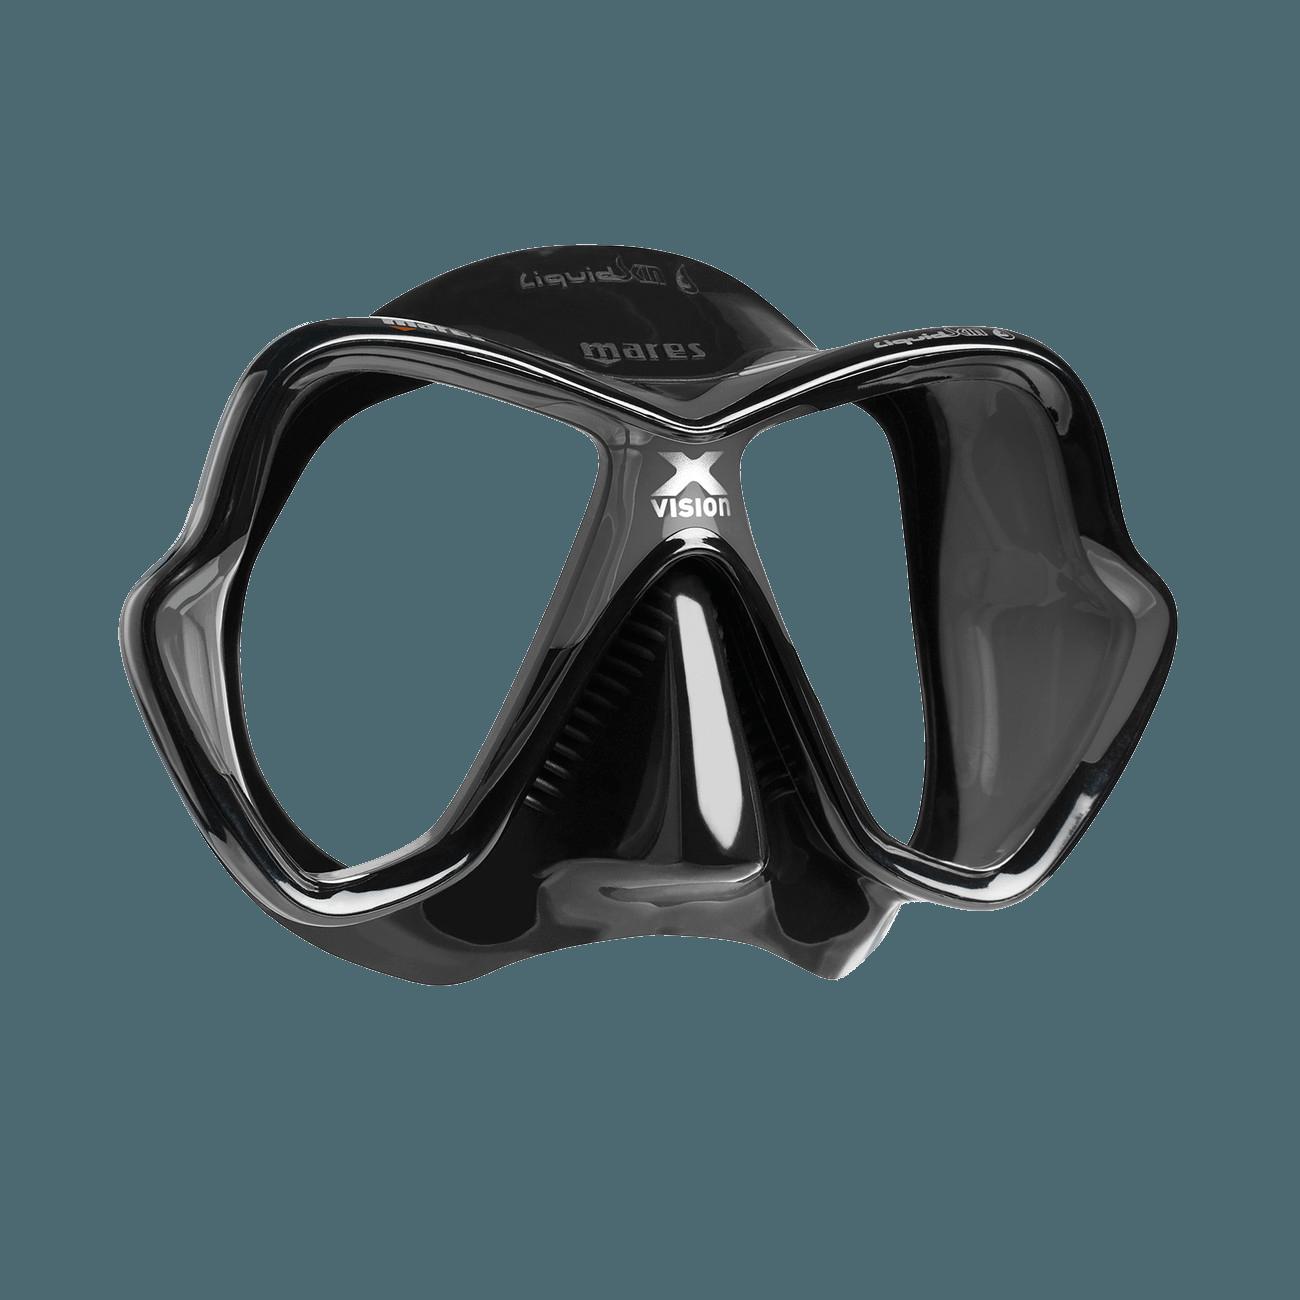 Mares X Vision Ultra Liquidskin Mask   Mares Dive Mask   Gill Divers